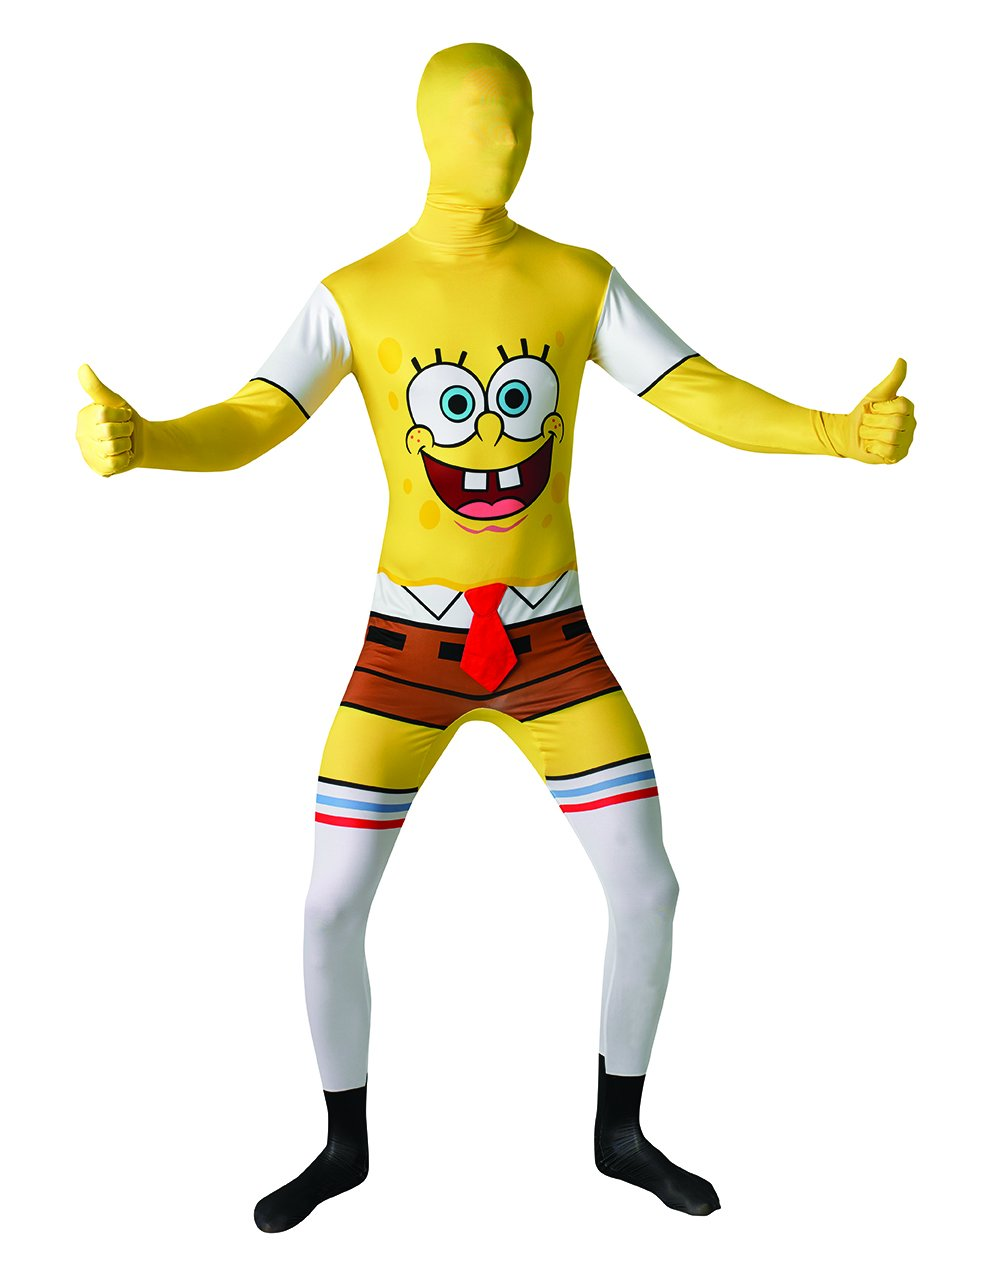 XL Rubie's Official Adult's Spongebob Square Pants 2nd Skin Costume, XLarge